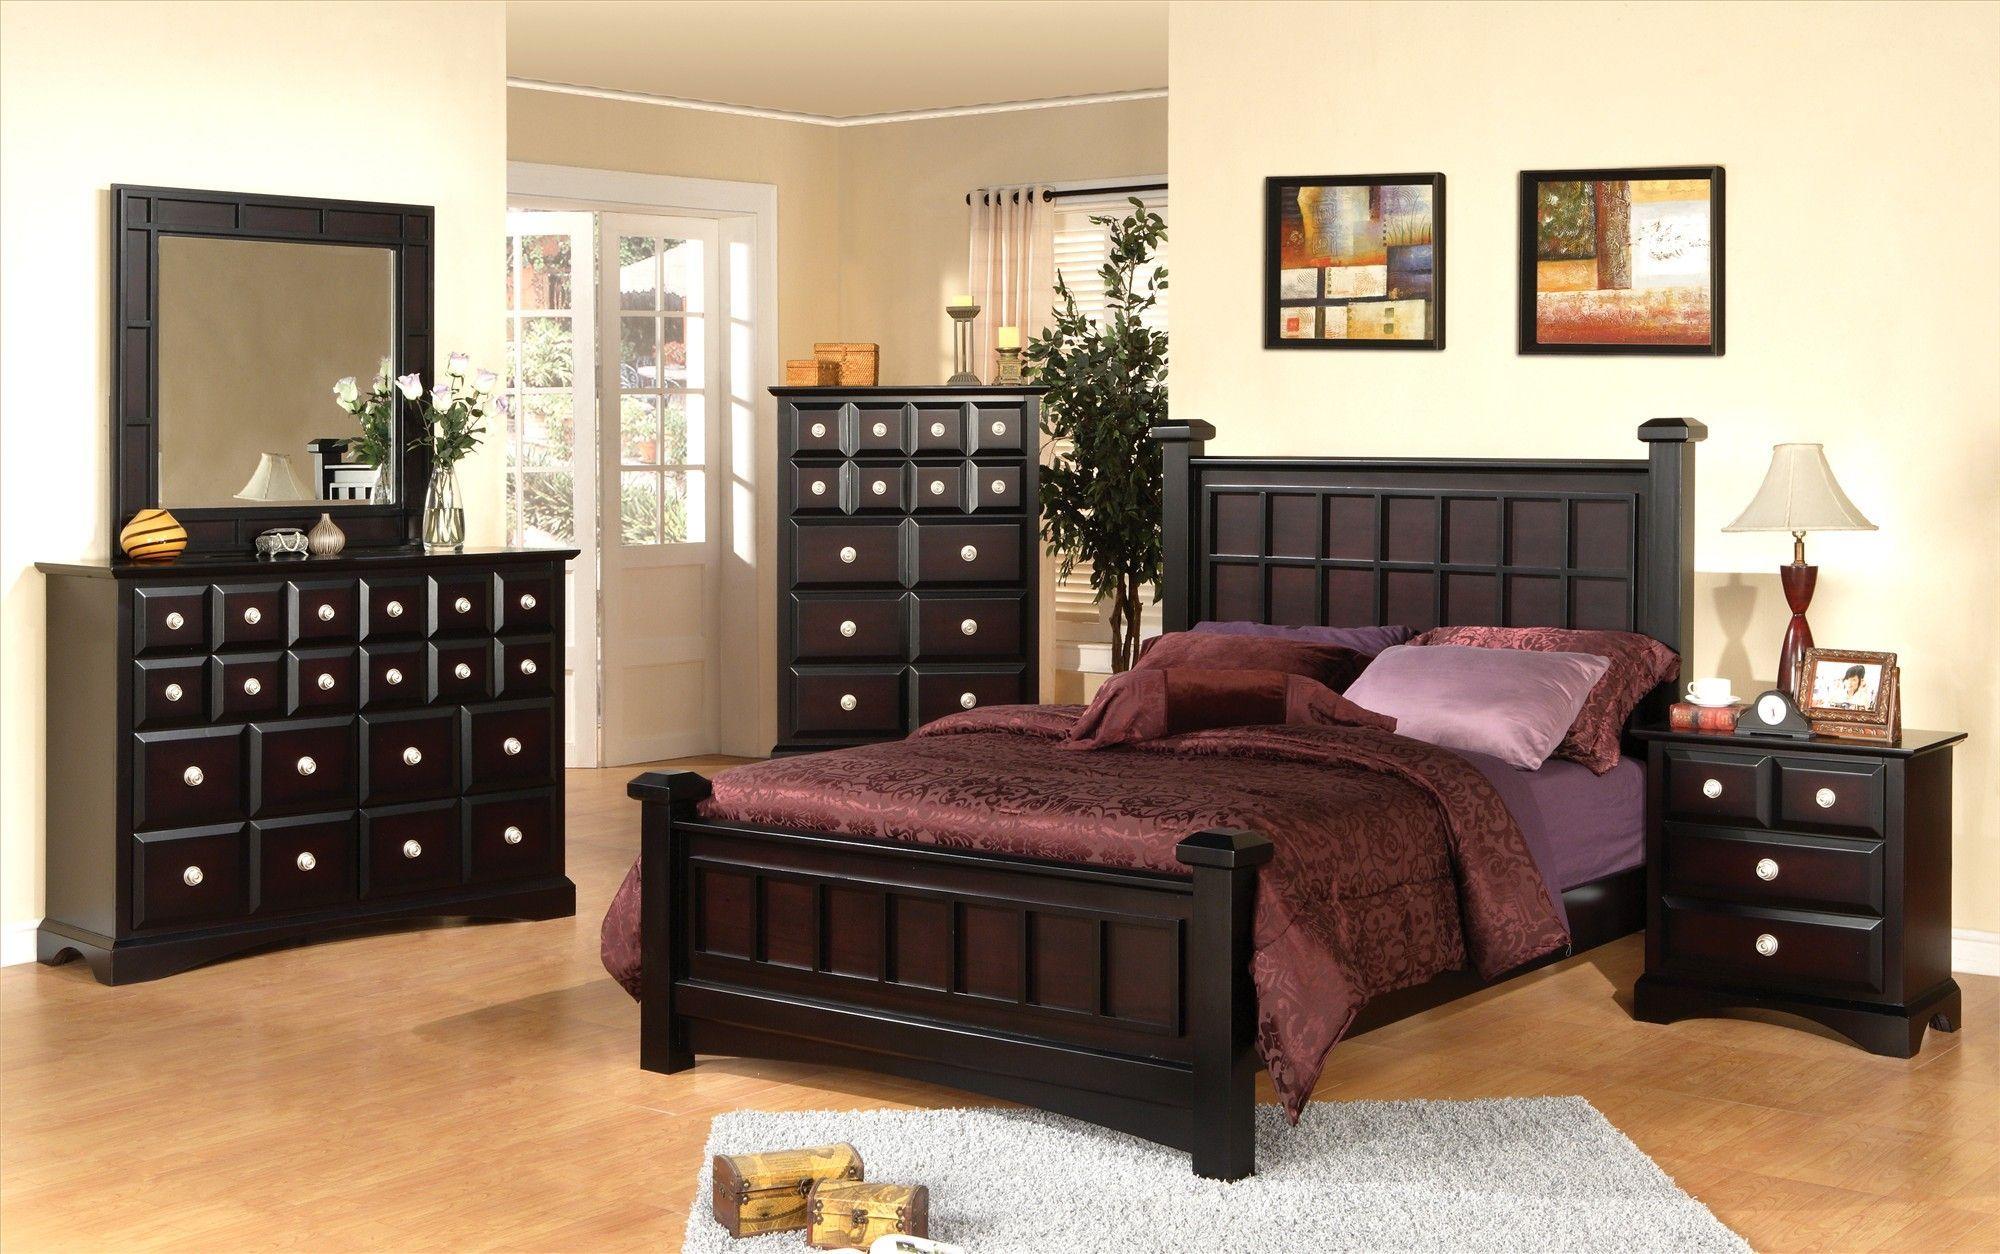 Latest Pakistani Wooden Furniture Design Ideas For Living Room Chiniot Wooden Furniture Furnitu Bedroom Furniture Design Bed Interior Bedroom Furniture Sets